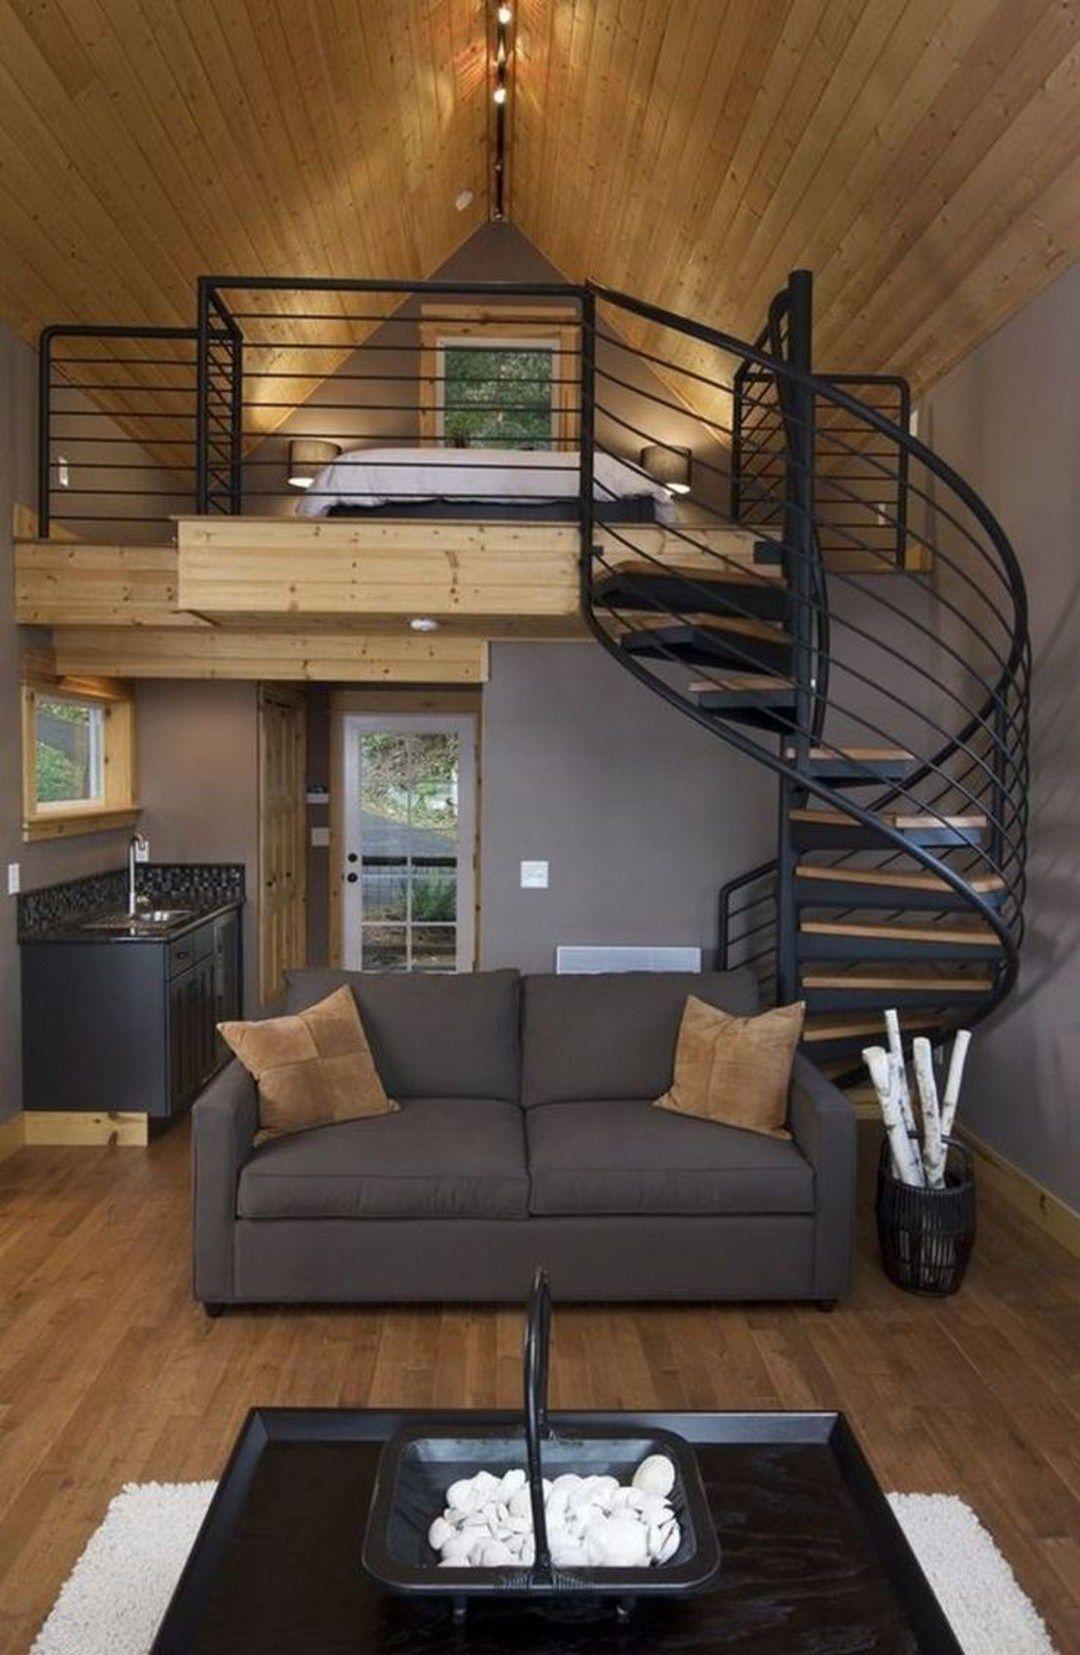 28 Cool House Design Ideas To Make Your Dream Home 13 Possible Decor Tiny House Interior Design Tiny House Living Tiny House Design